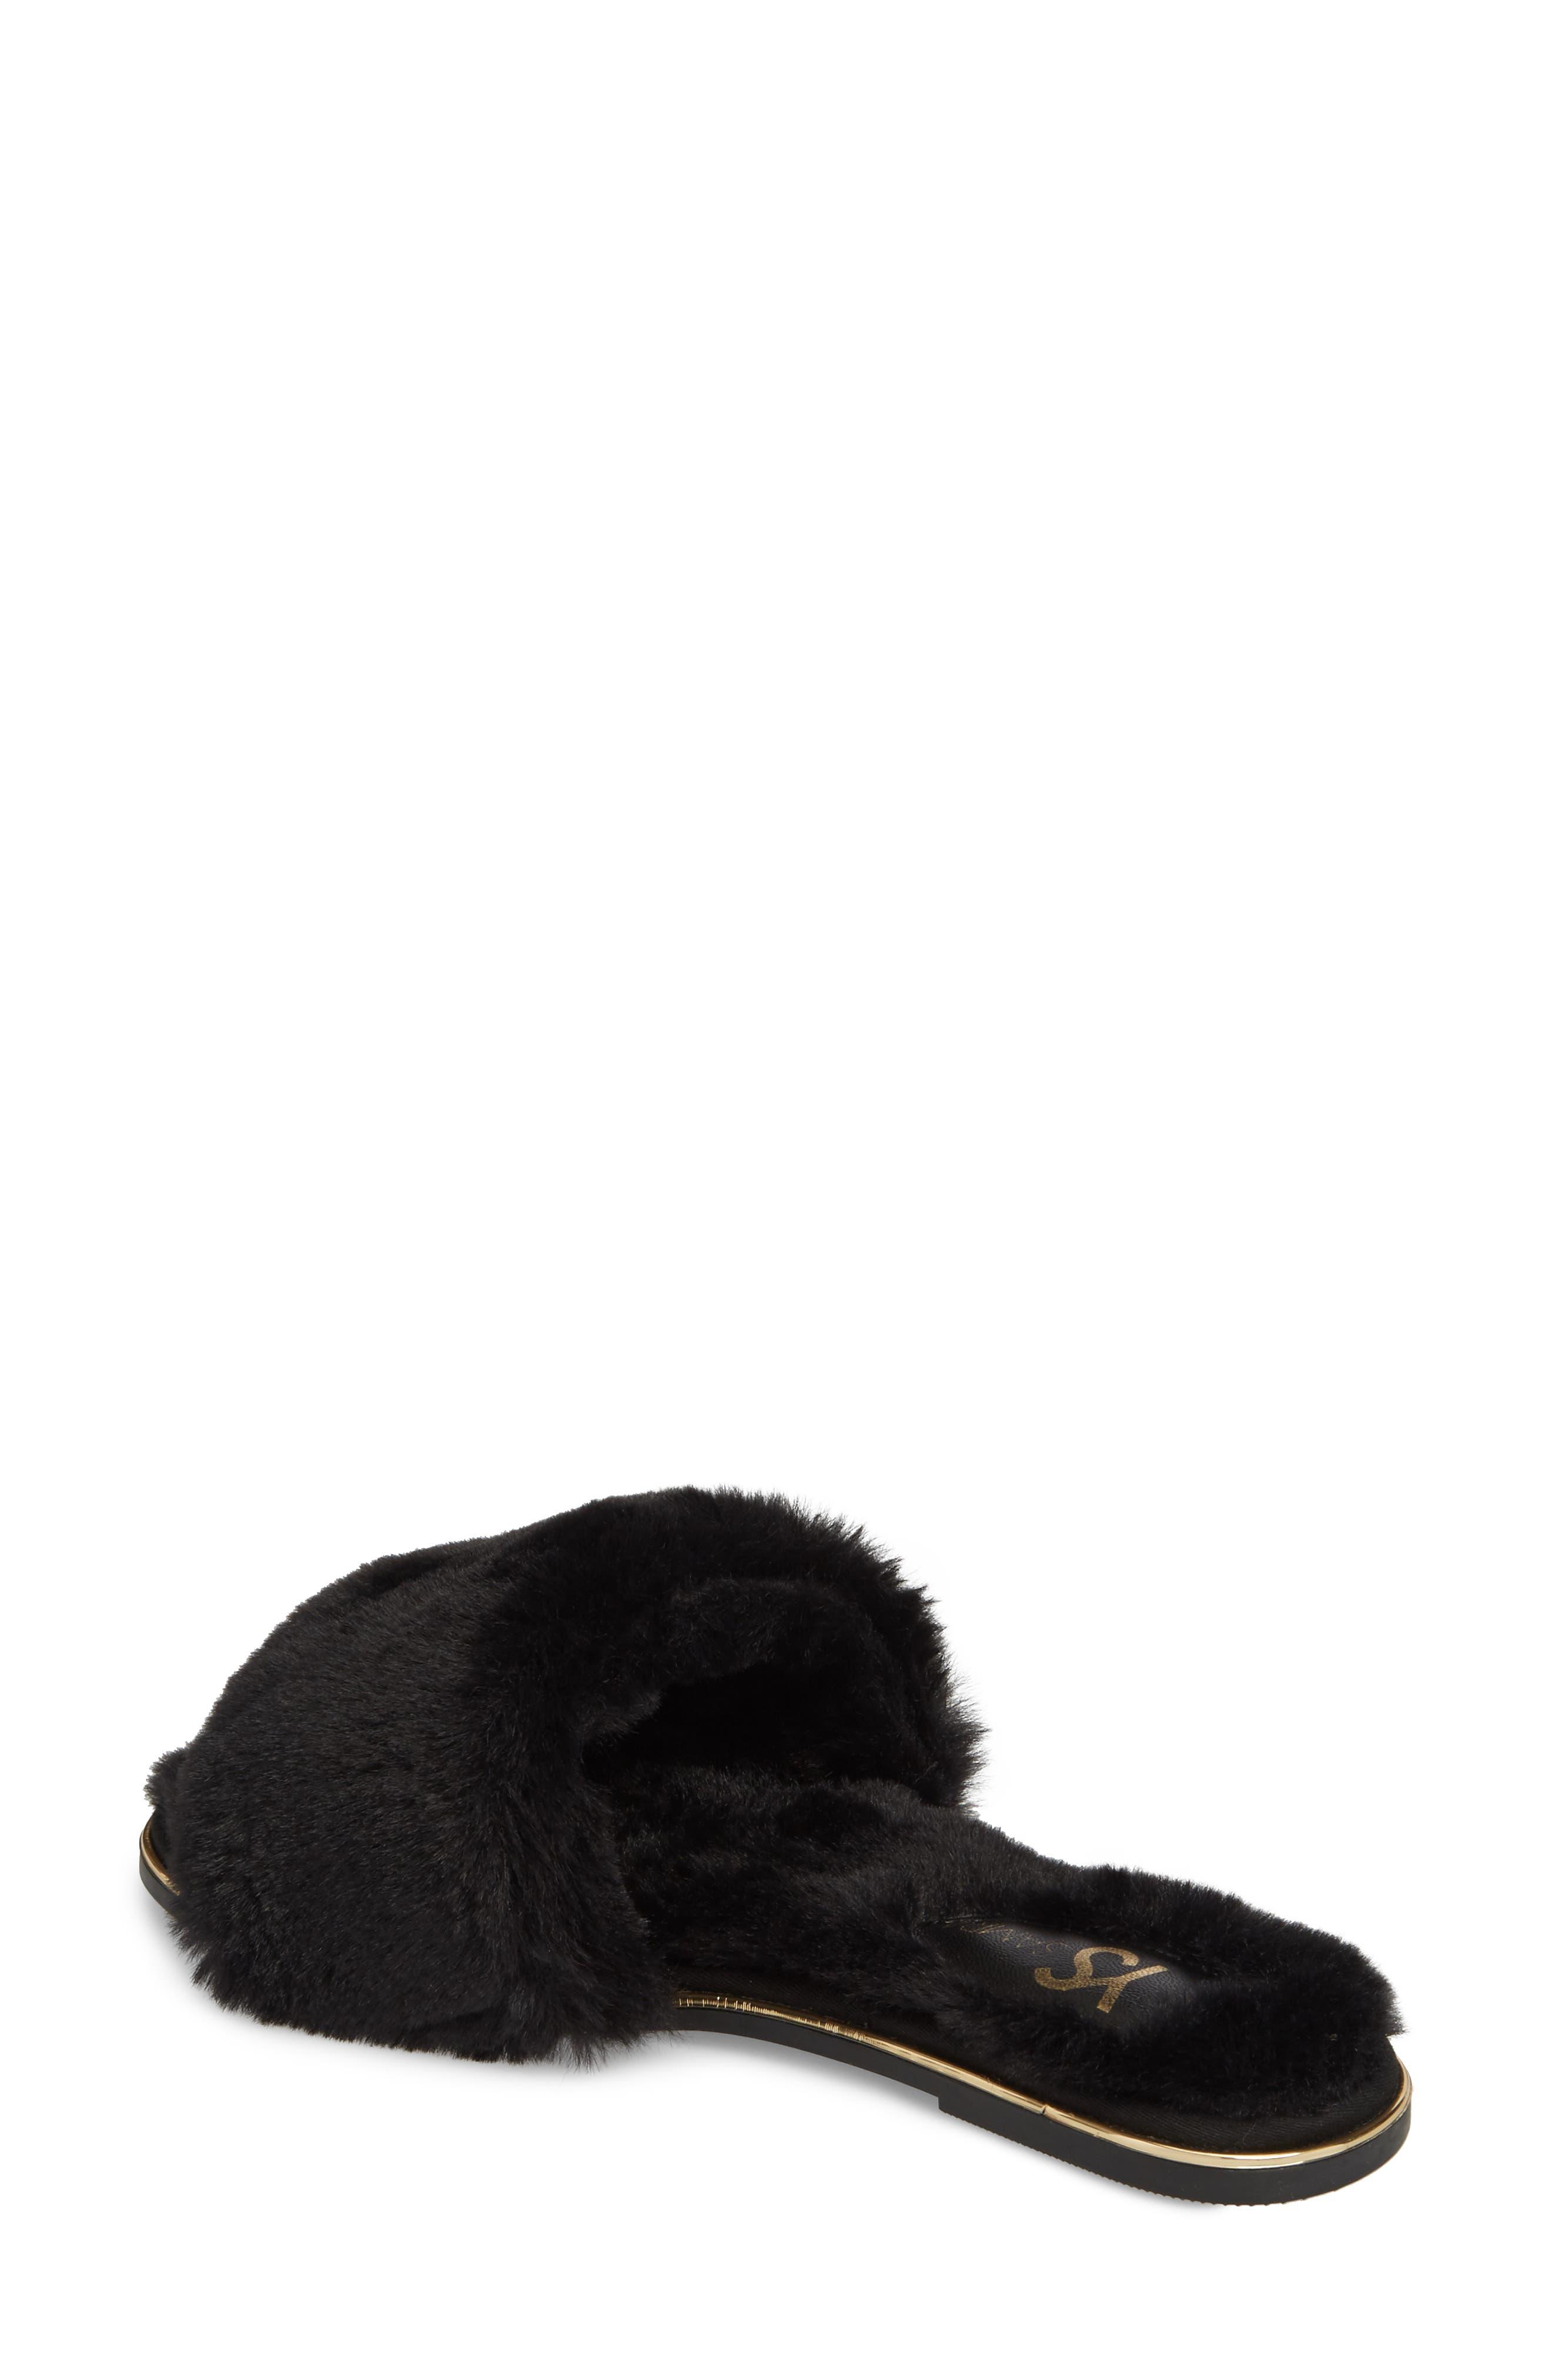 Rose Faux Fur Slide Sandal,                             Alternate thumbnail 2, color,                             BLACK FAUX FUR